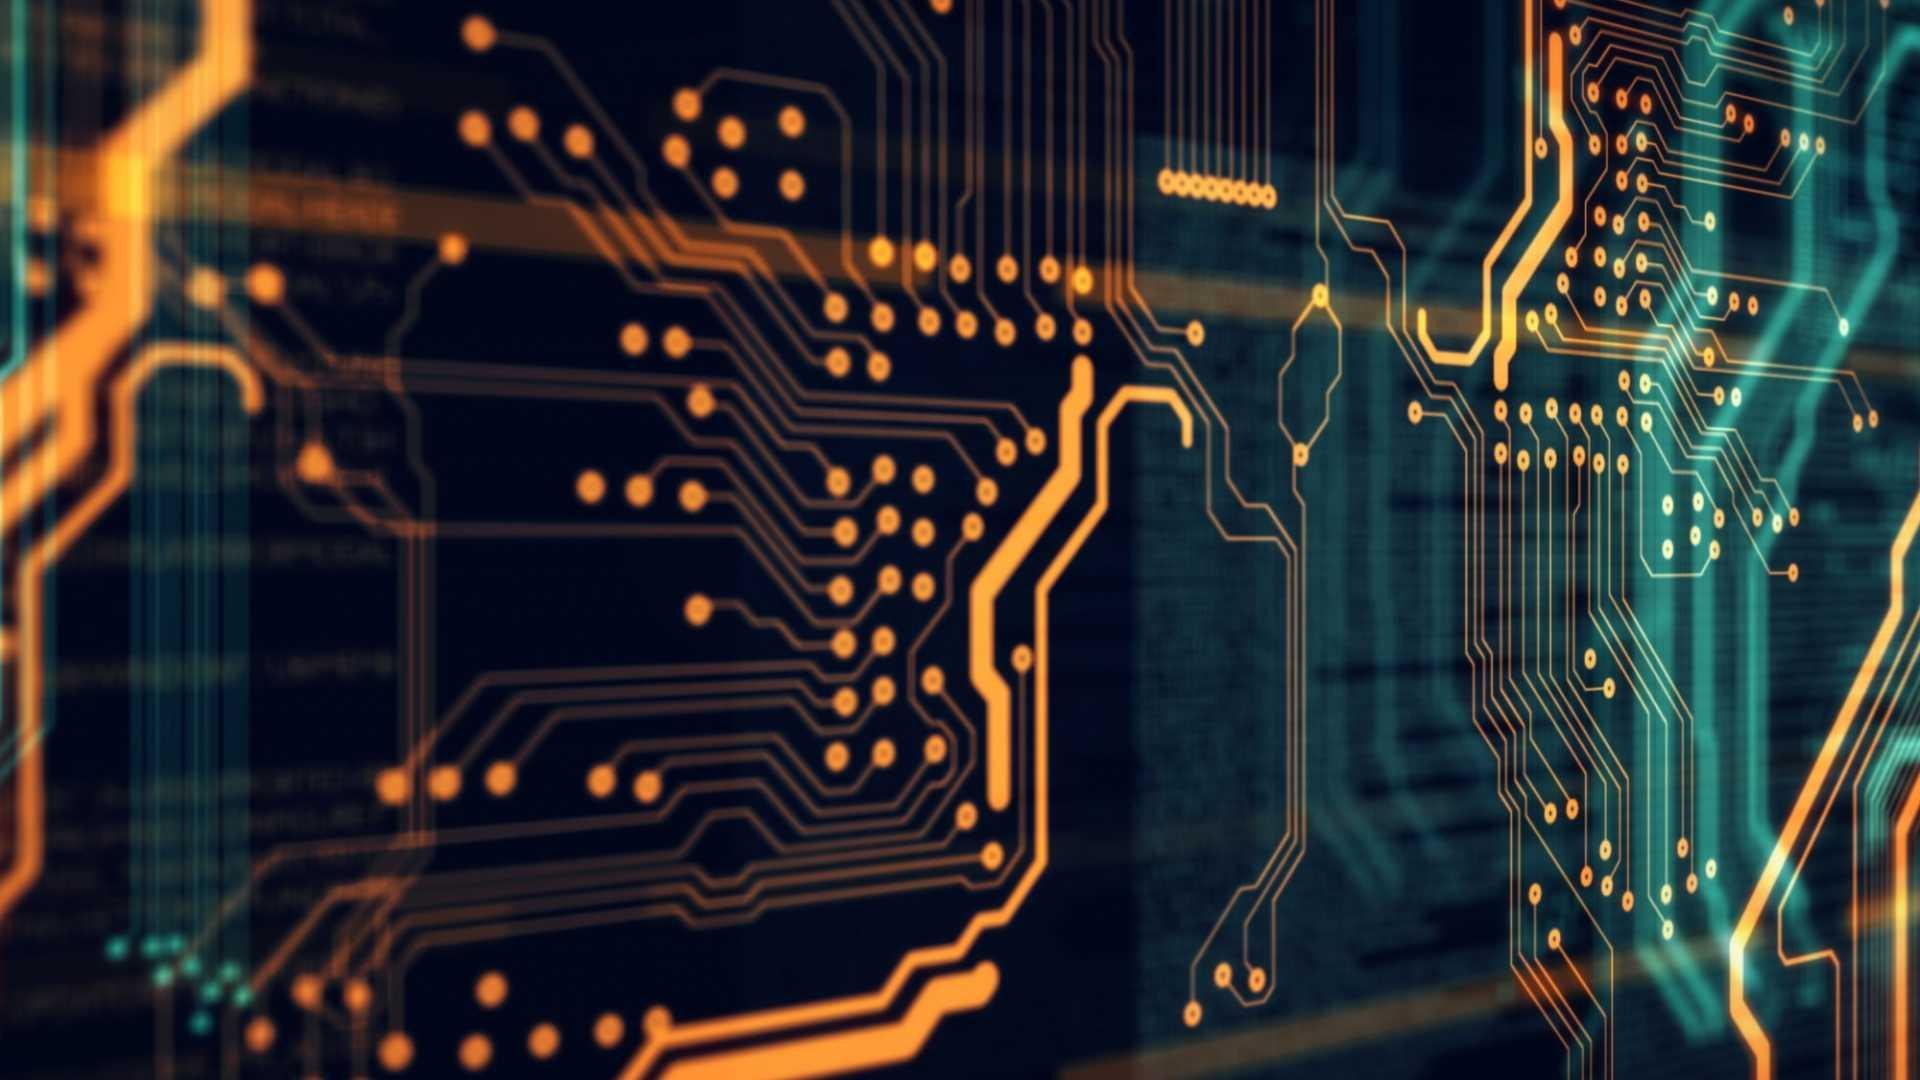 Future of Venture Capital Depends on Tech Giants